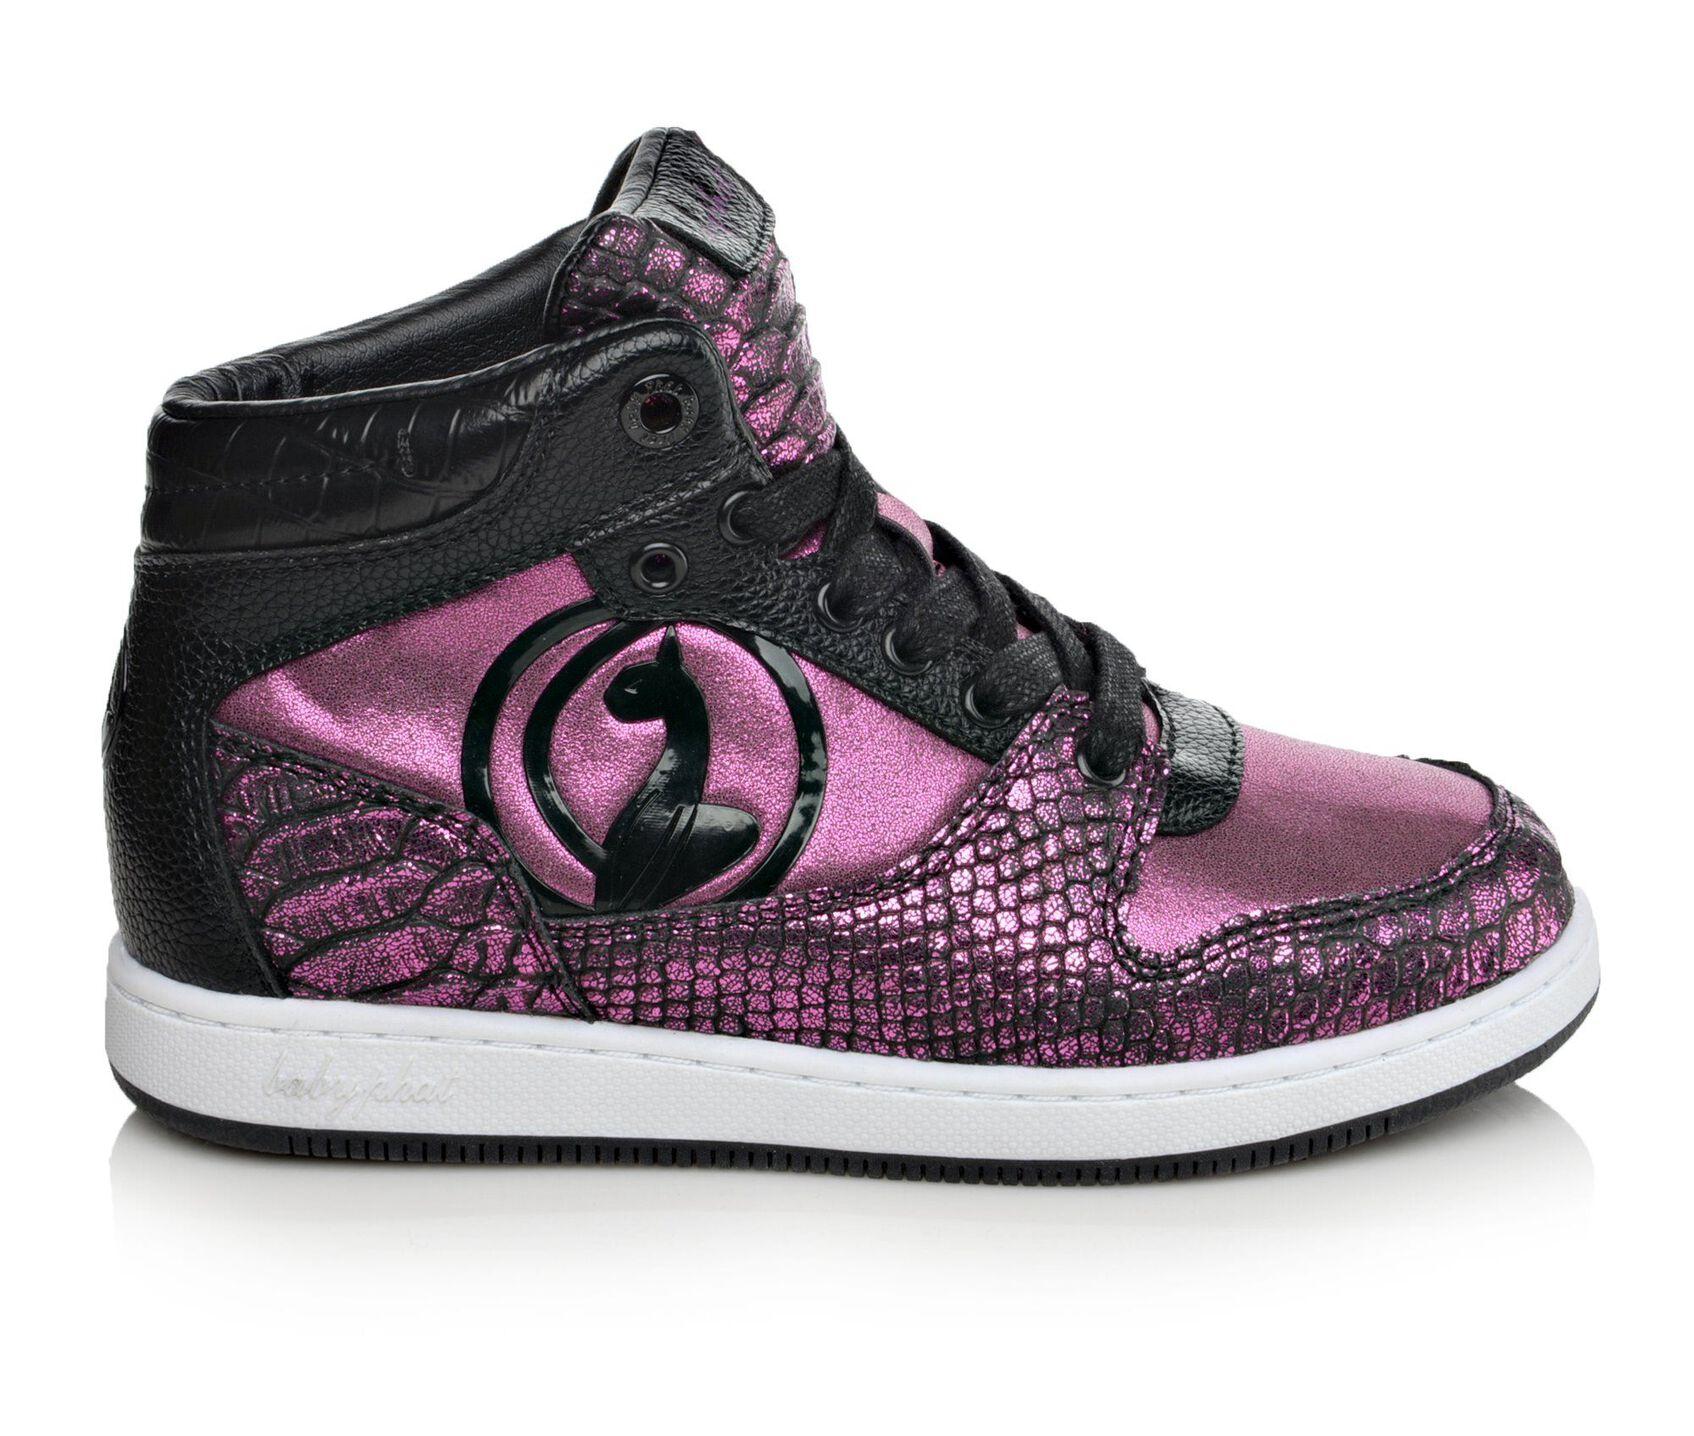 Girls Baby Phat Tanya 10 7 Sneakers